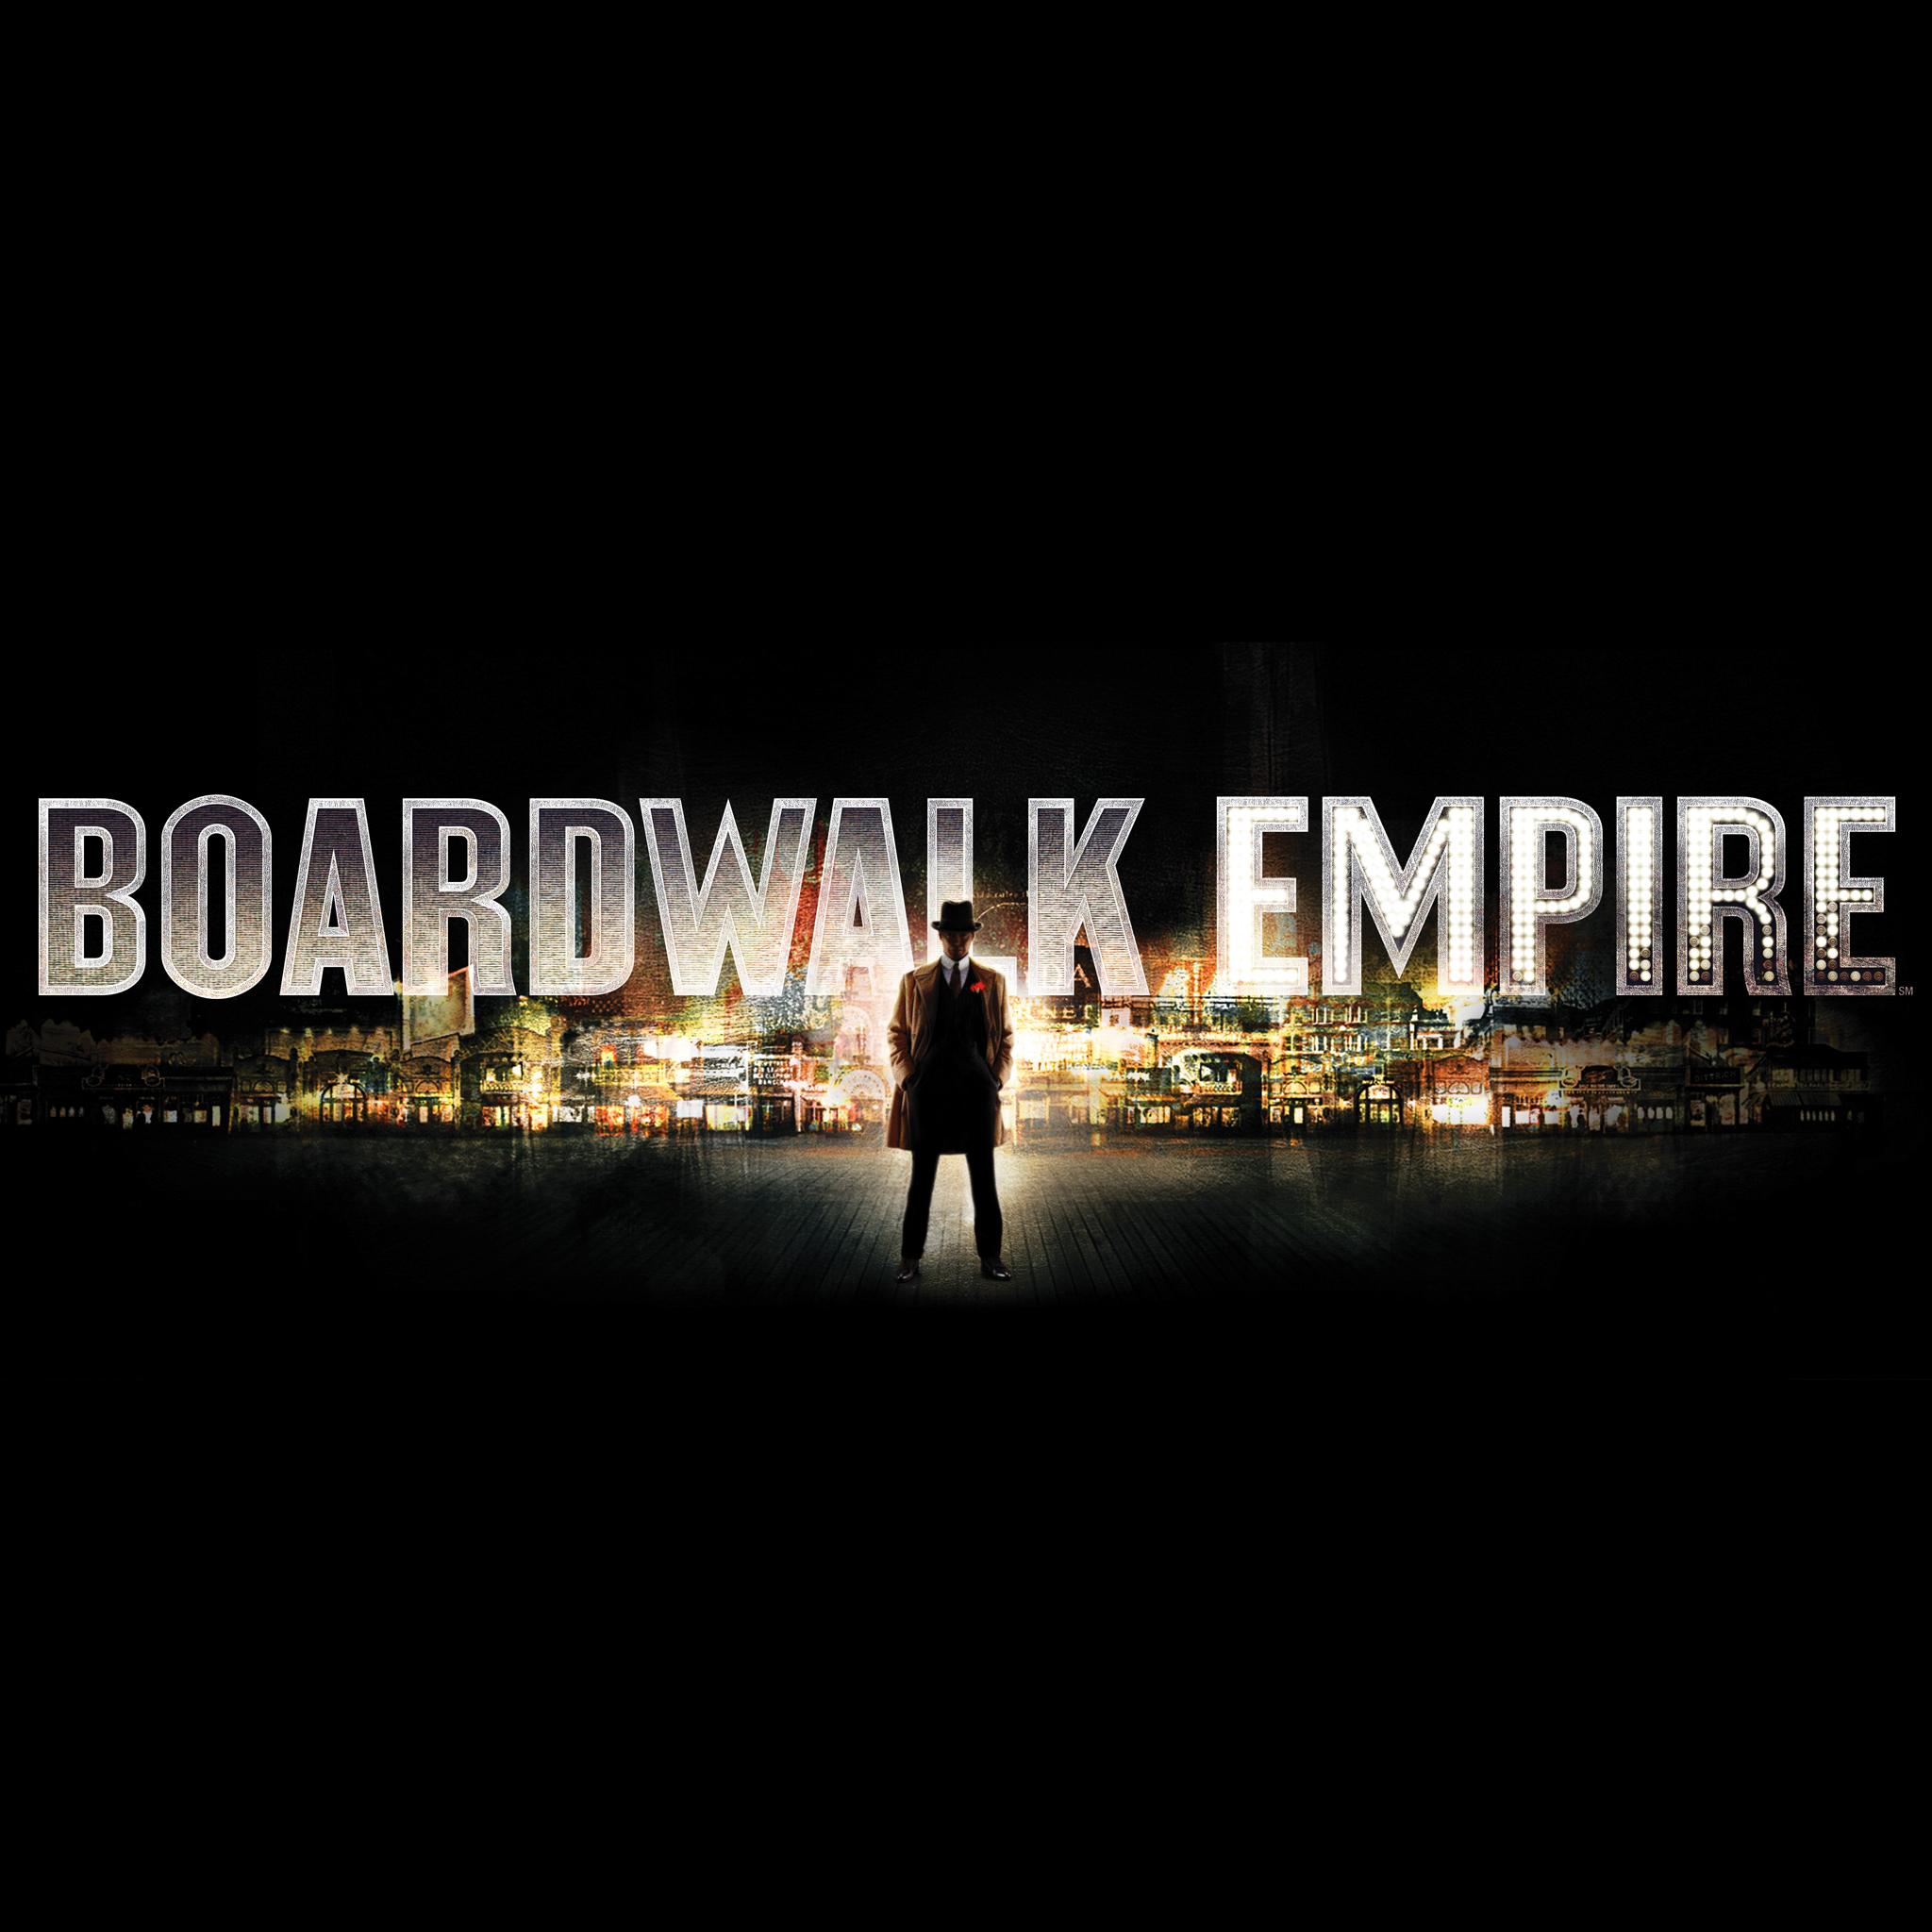 Broadwalk-Empire-3Wallpapers-iPad-Retina